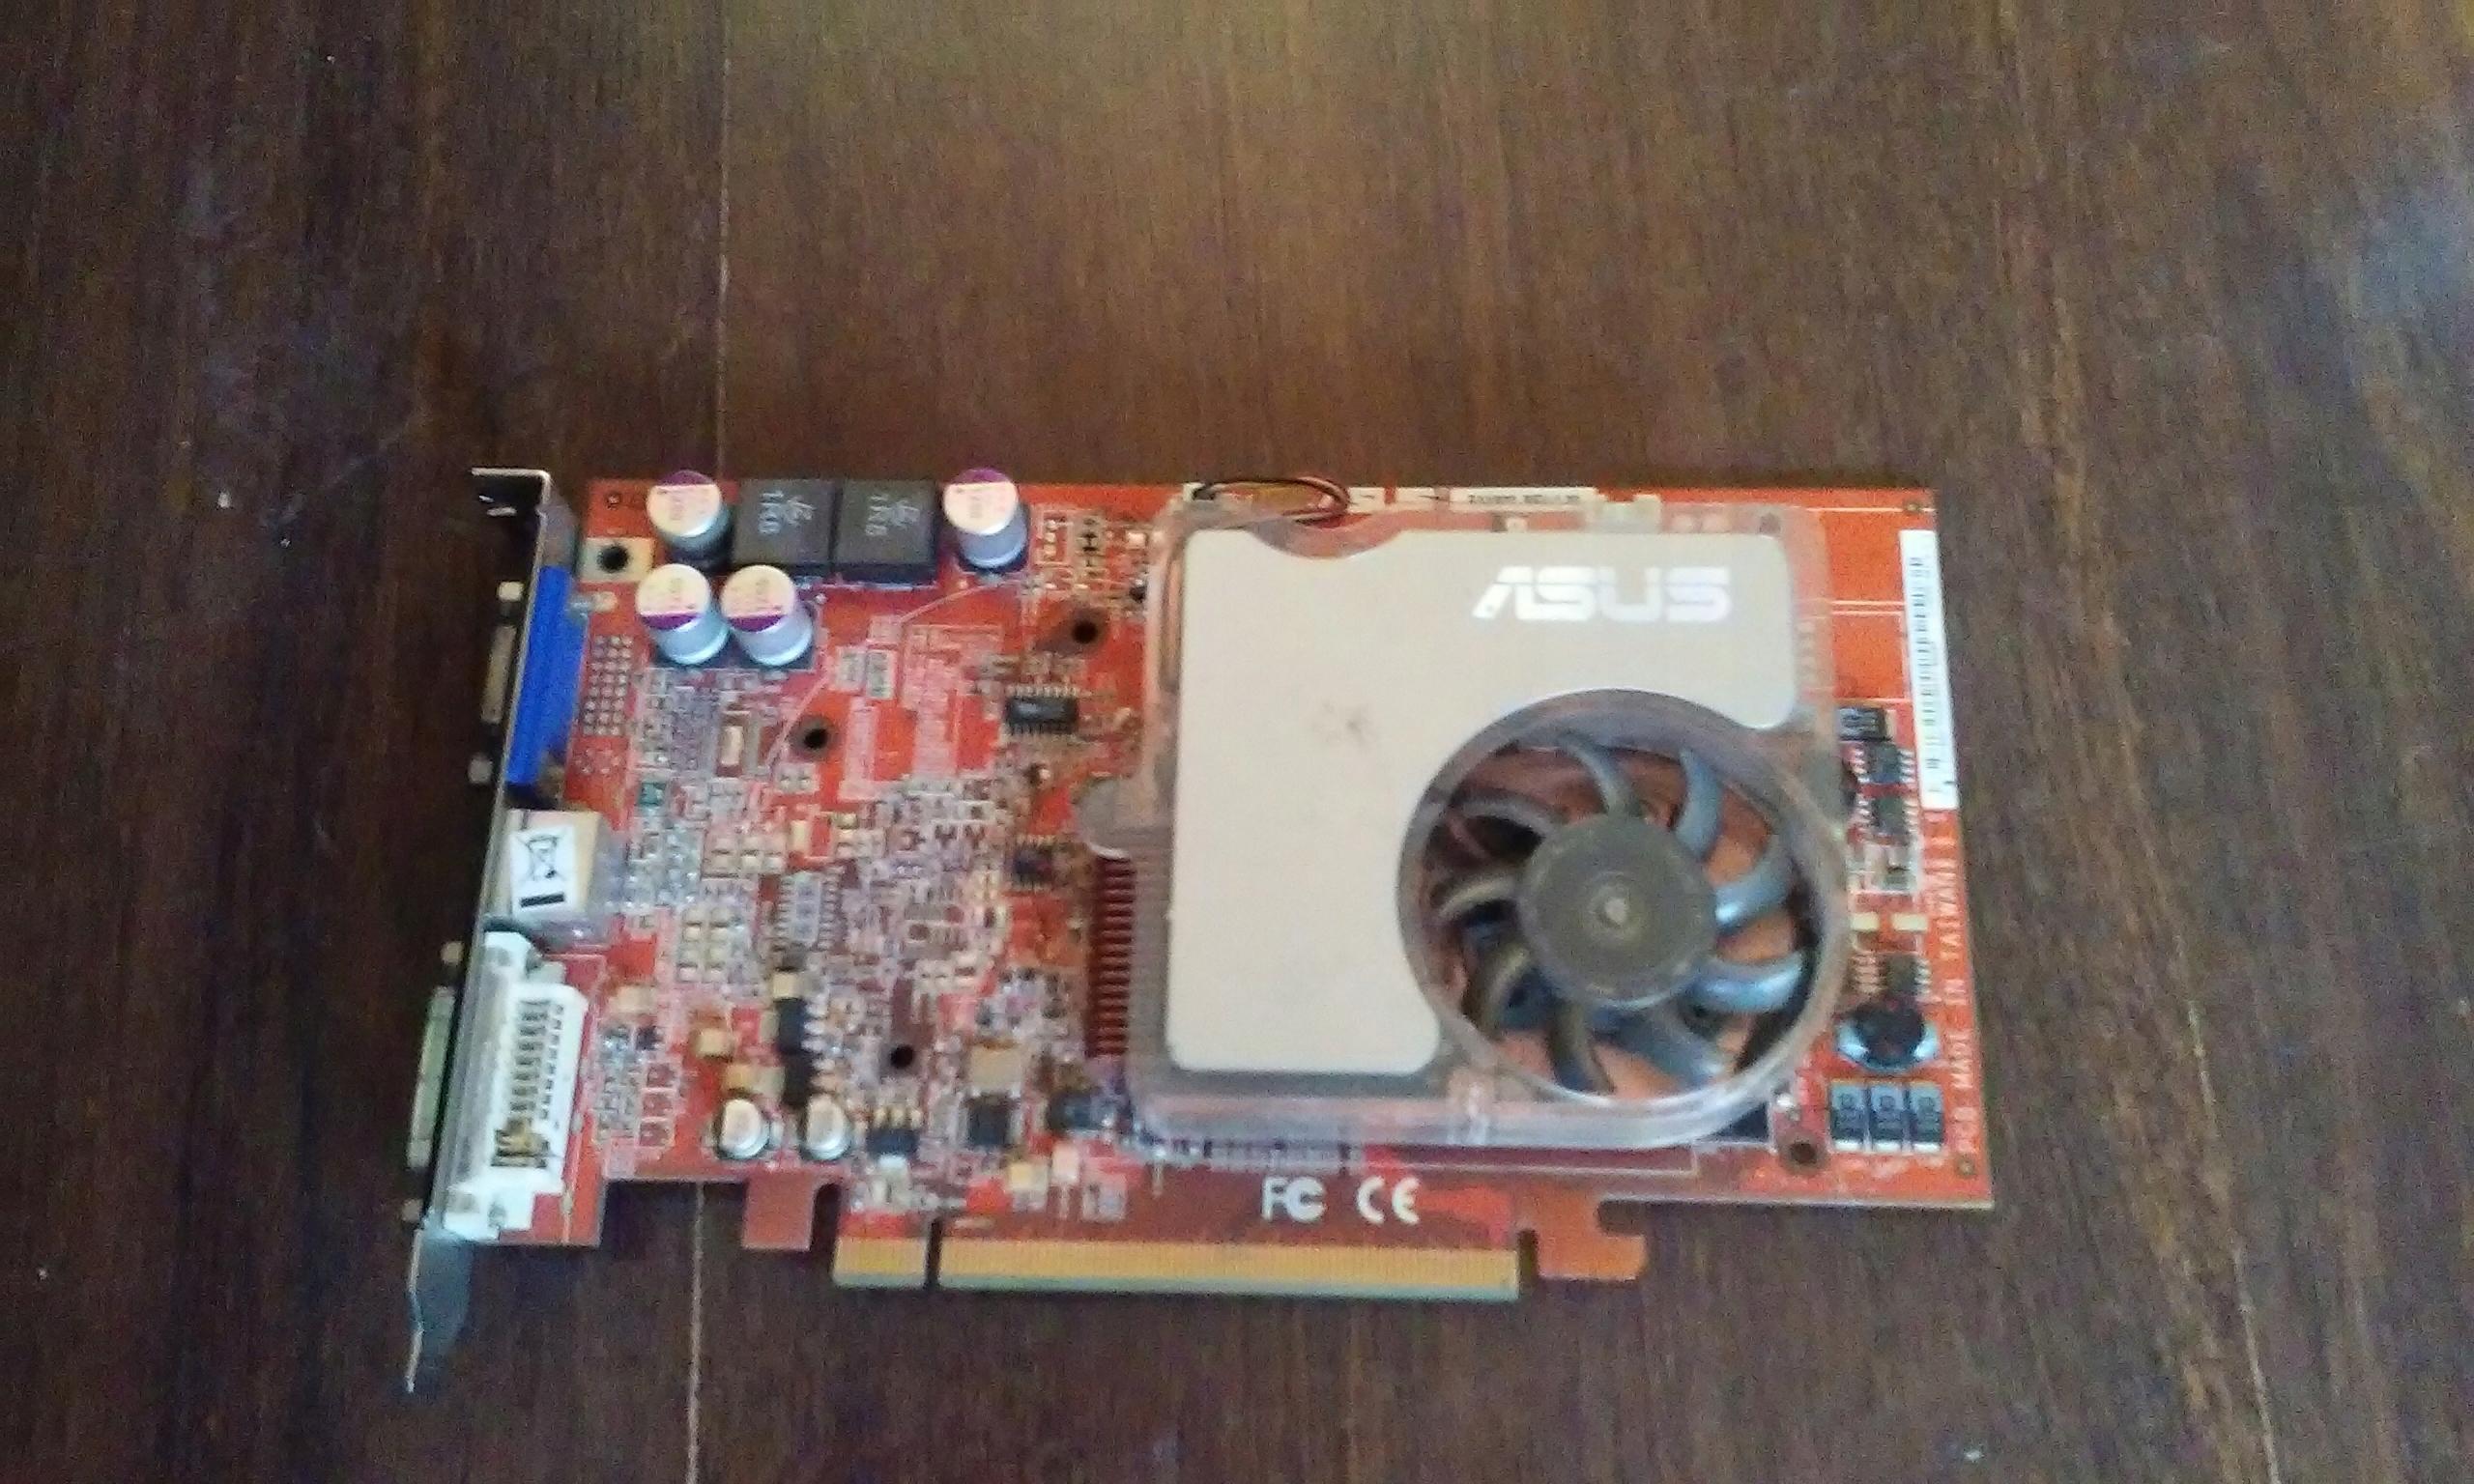 Asus ATI Radeon X800 EAX800/TD/128M Drivers for Mac